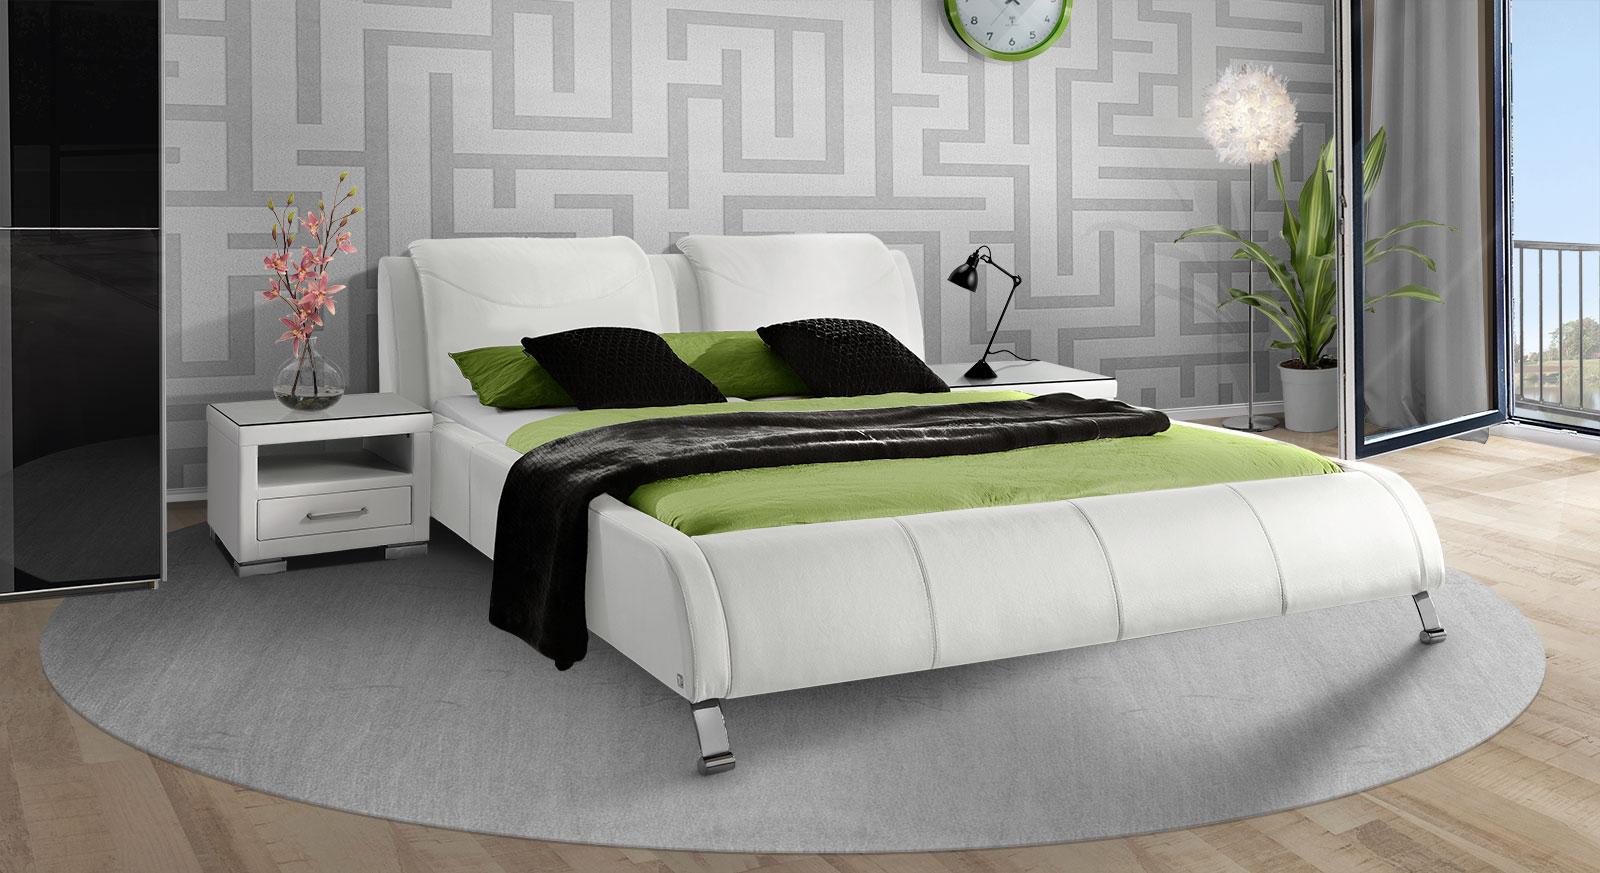 Bett Coventry in stilvollem, weißem Echtleder